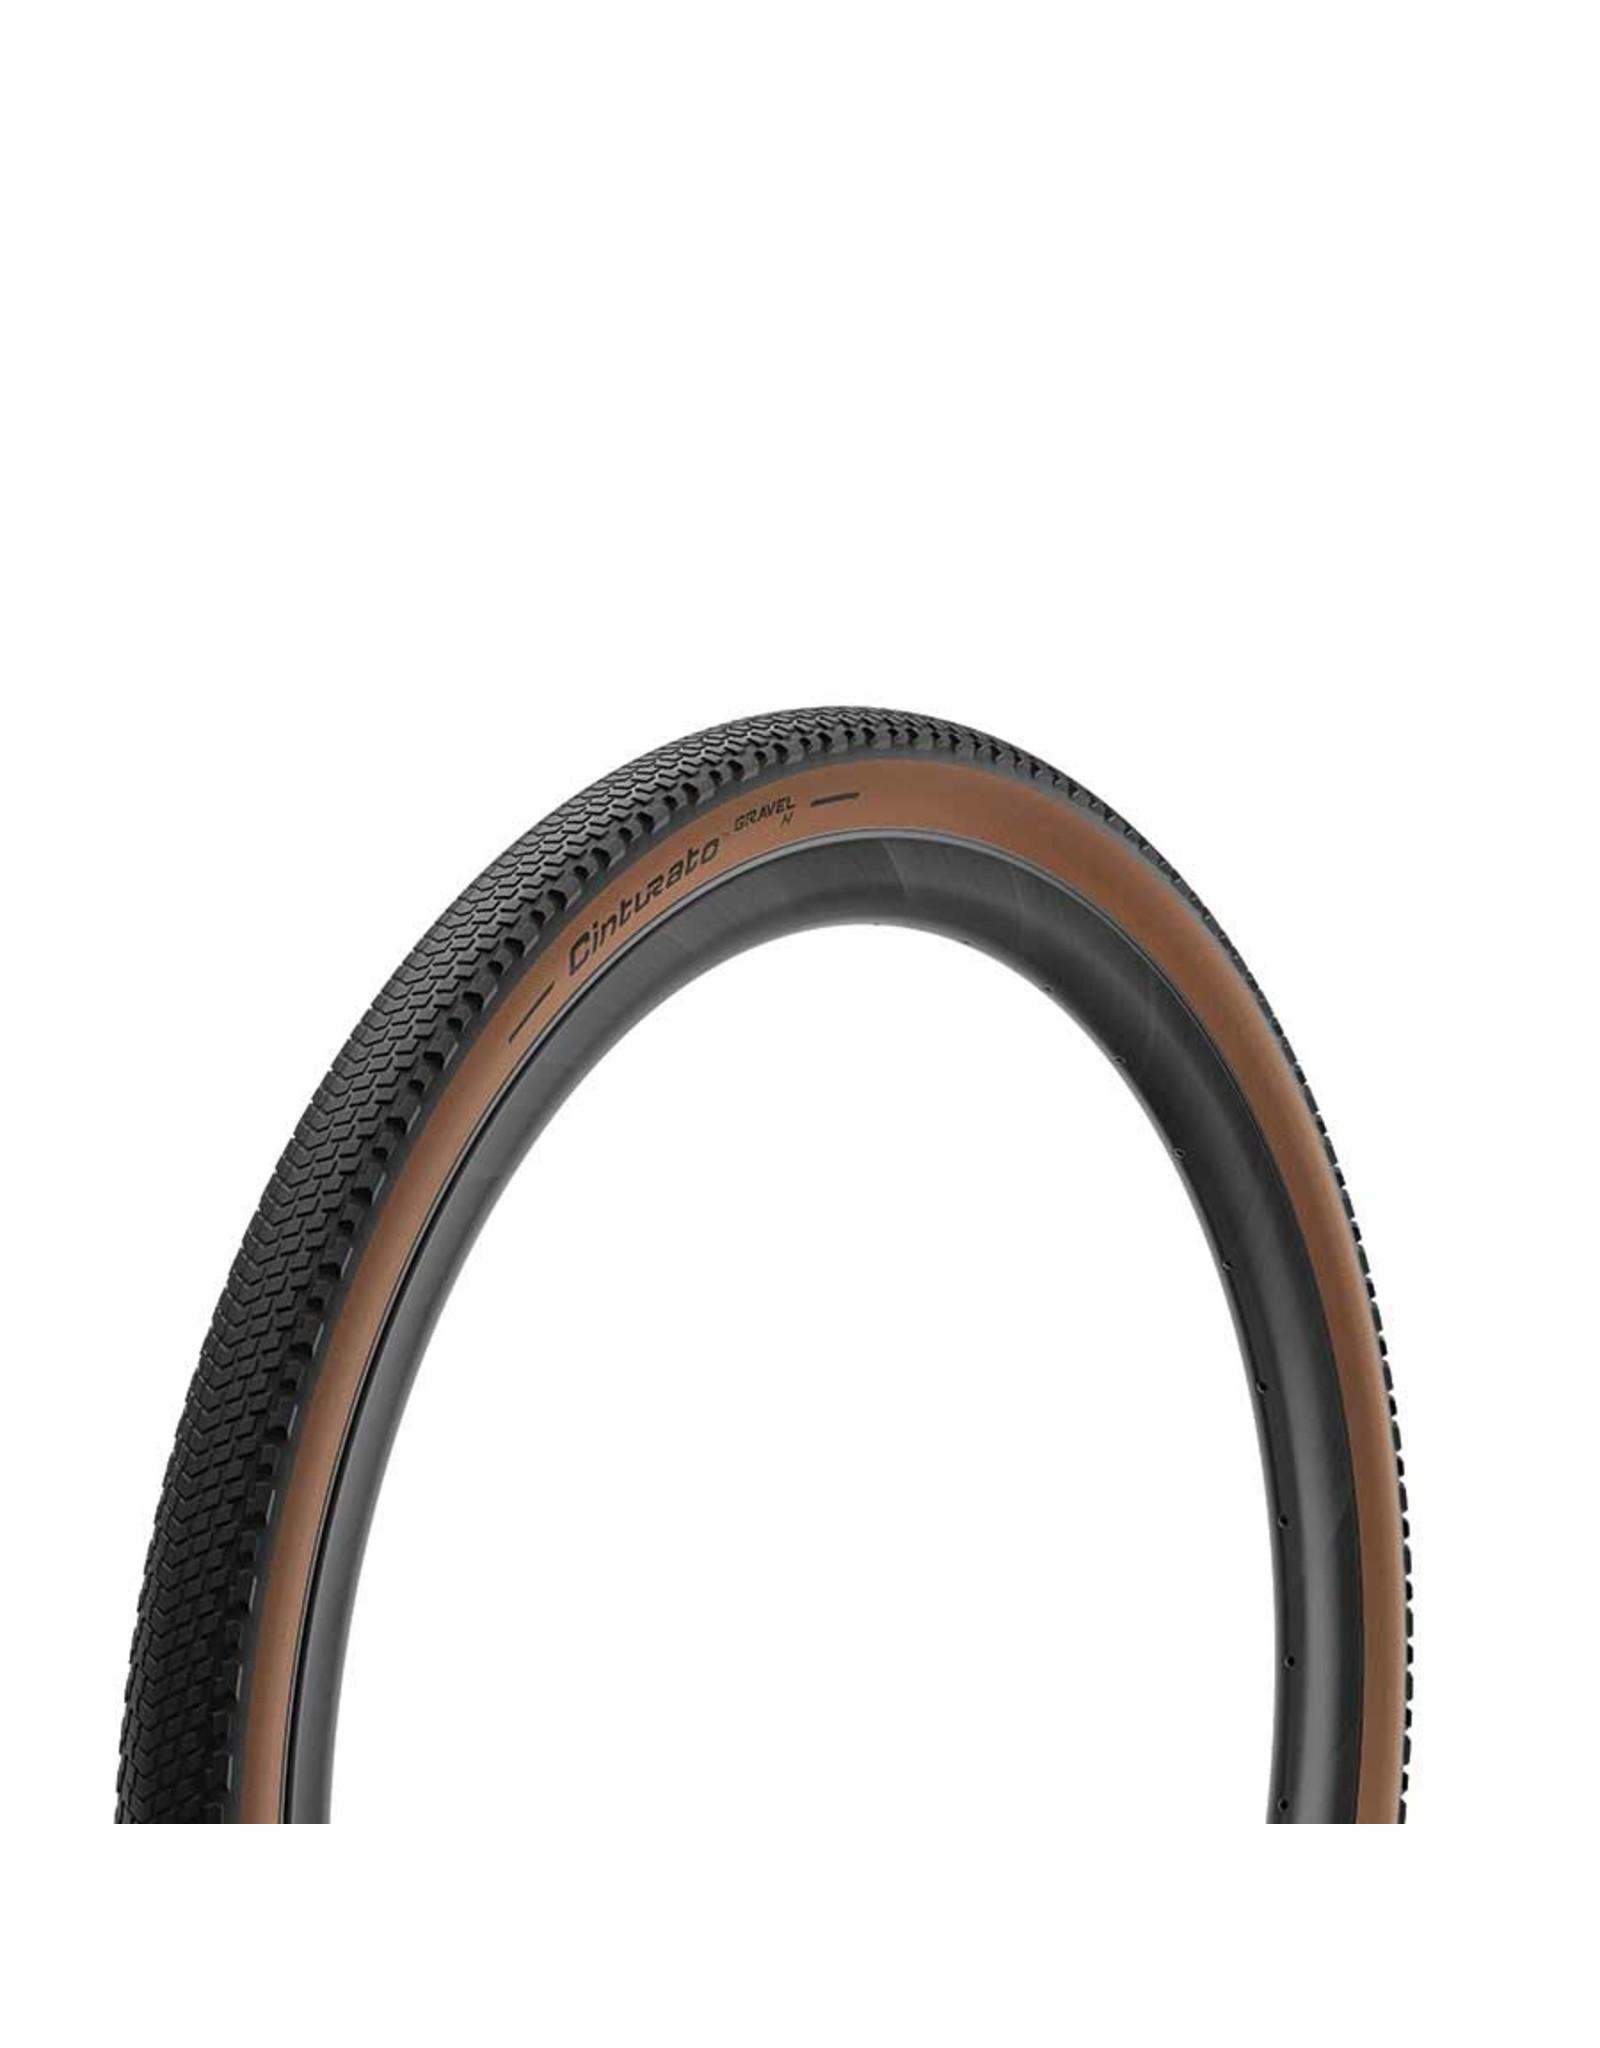 Pirelli Pirelli, Cinturato Gravel H, Tire, 650Bx45, Folding, Tubeless Ready, SpeedGrip, 127TPI, Beige